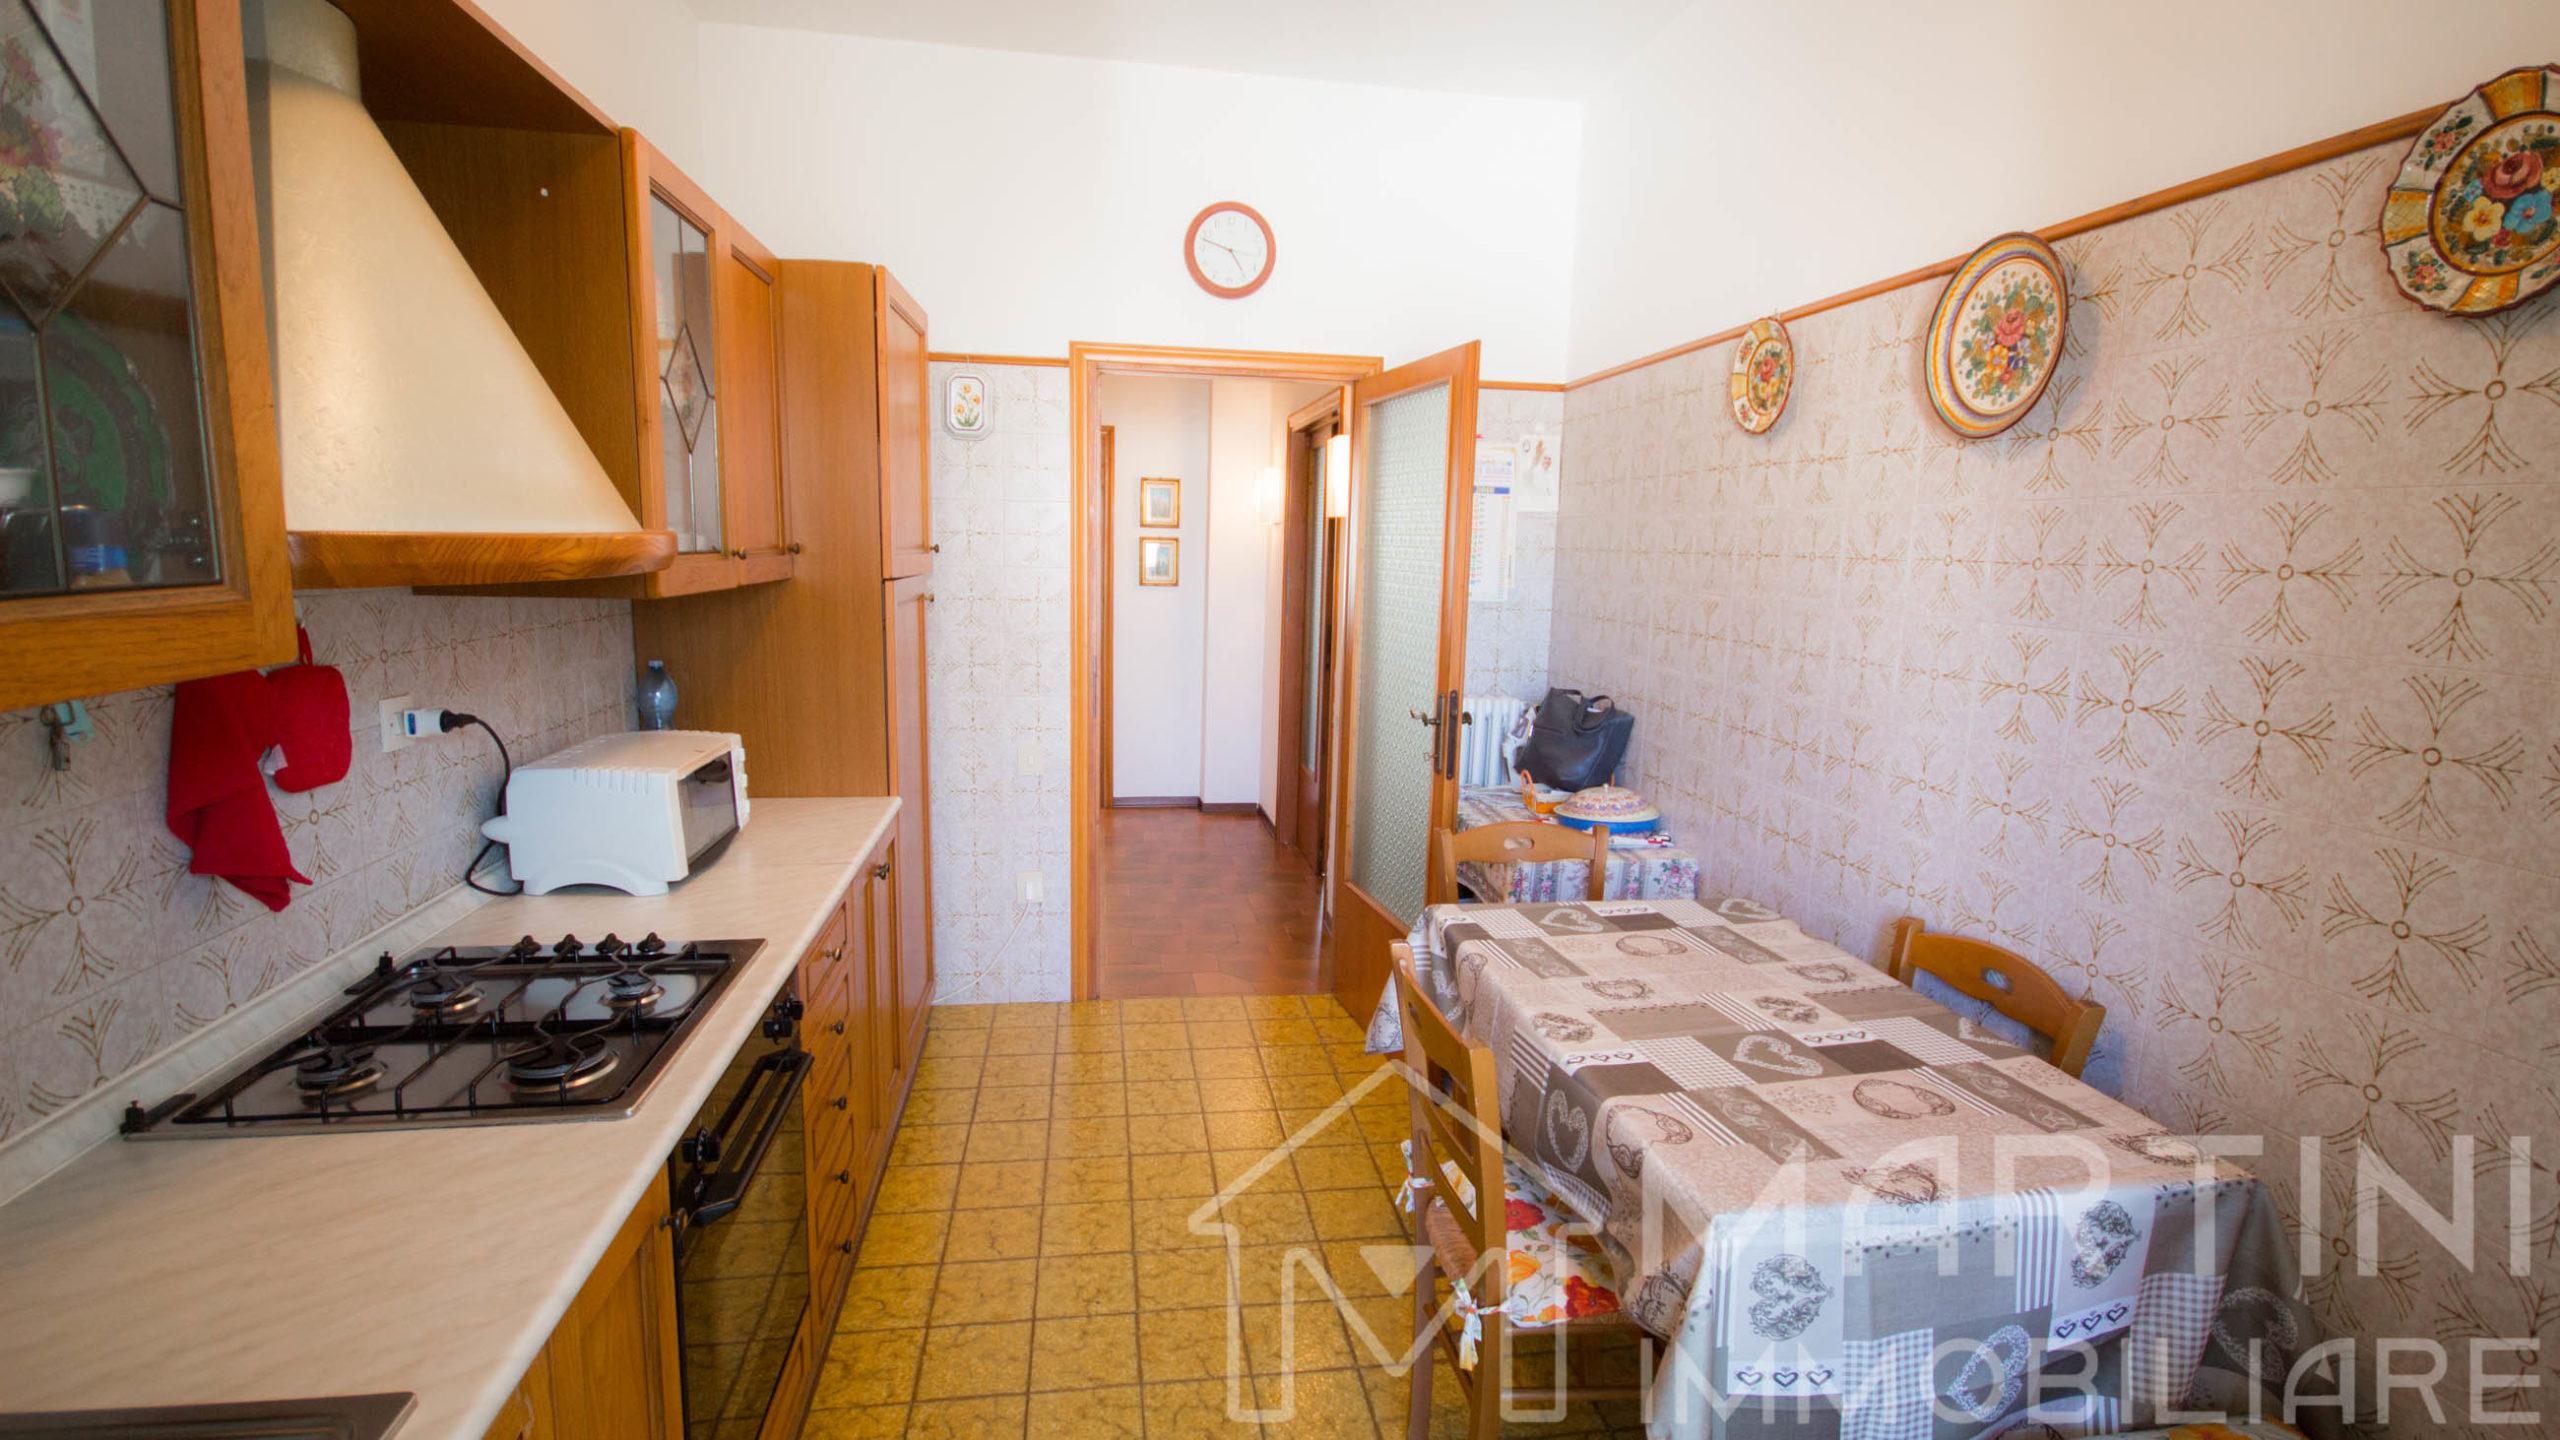 Zona Palazzi Rossi Casa Vacanze al Mare a Follonica